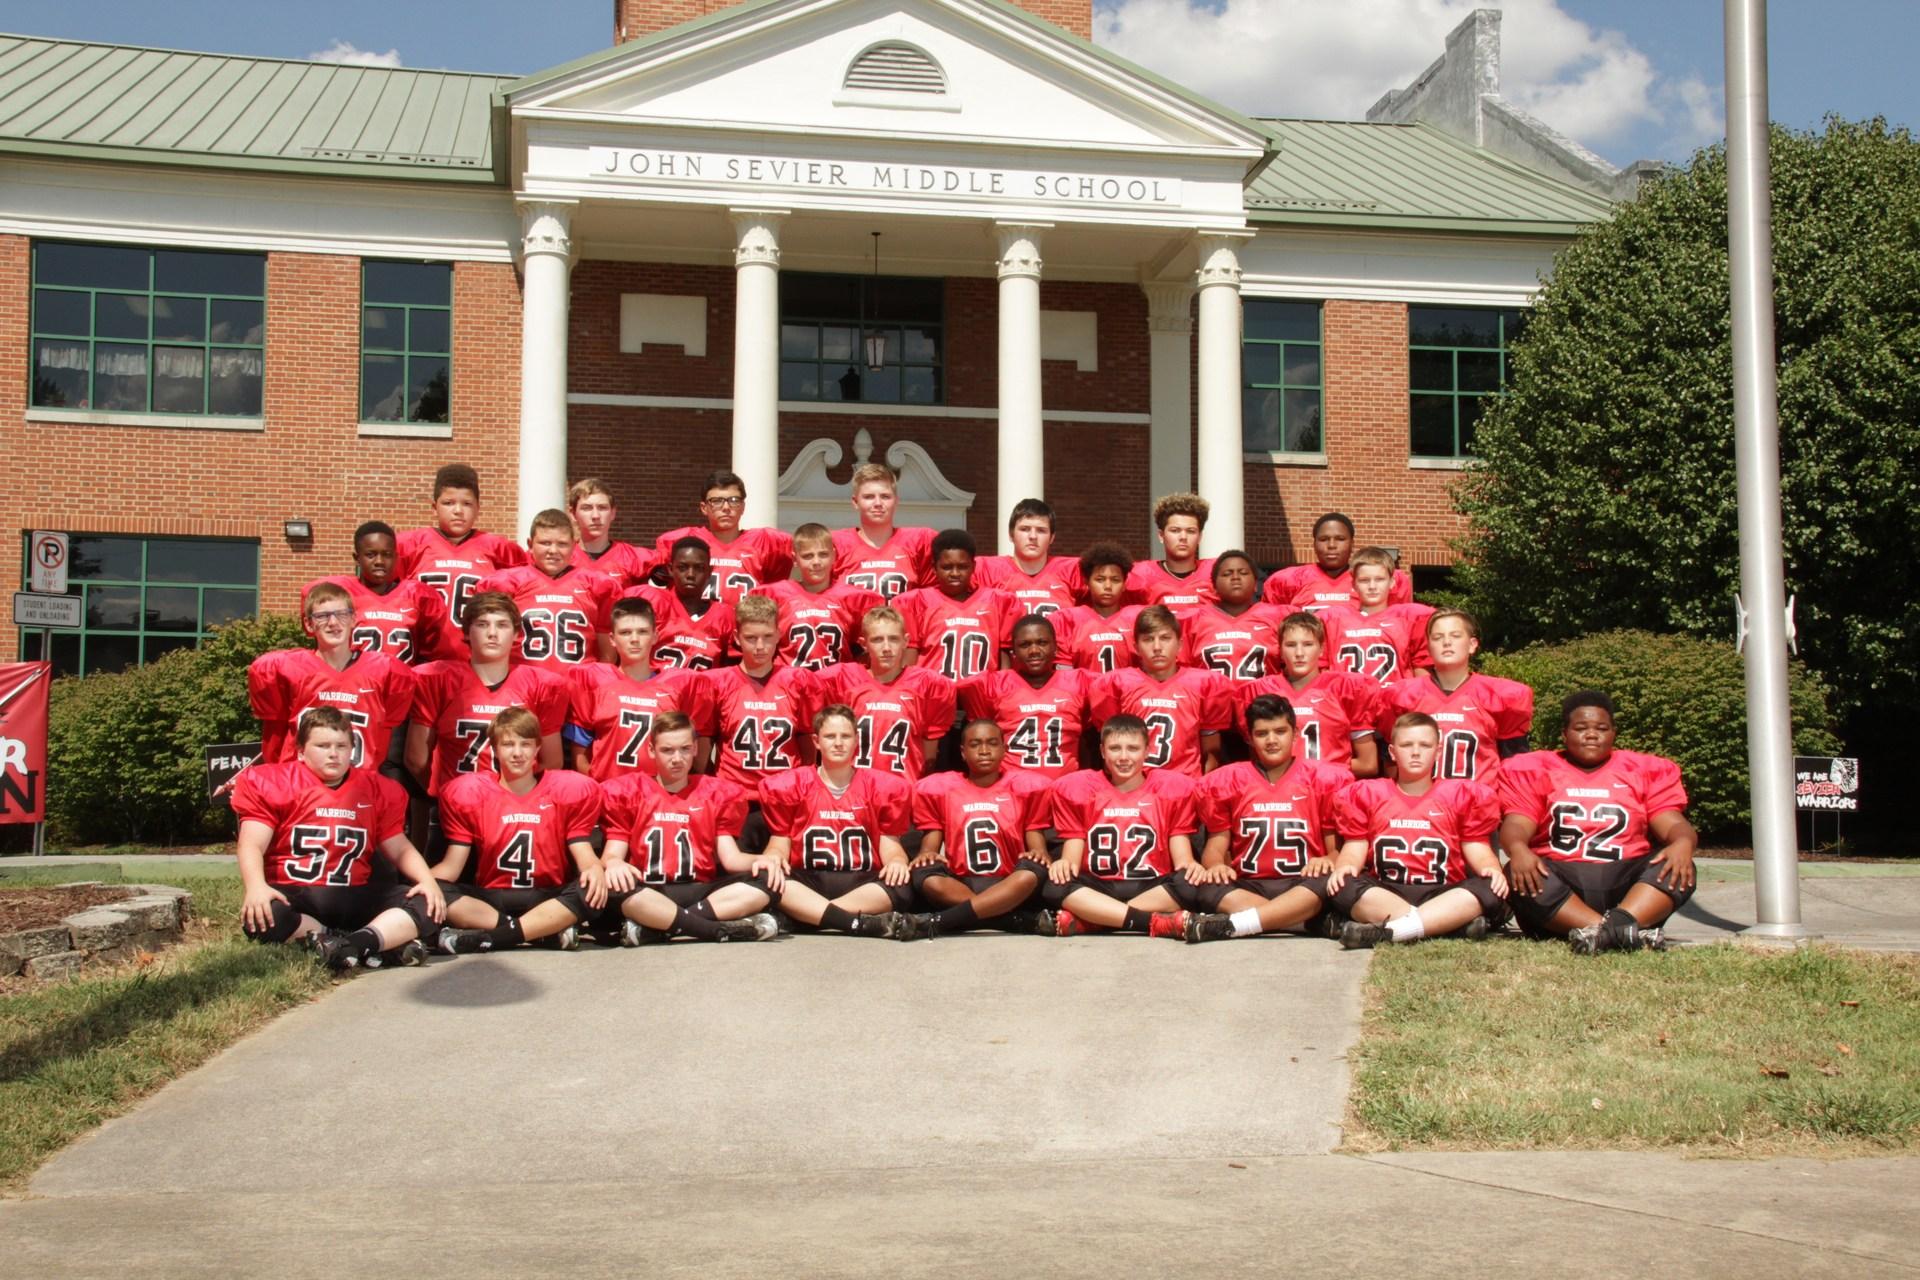 JSMS Football Team